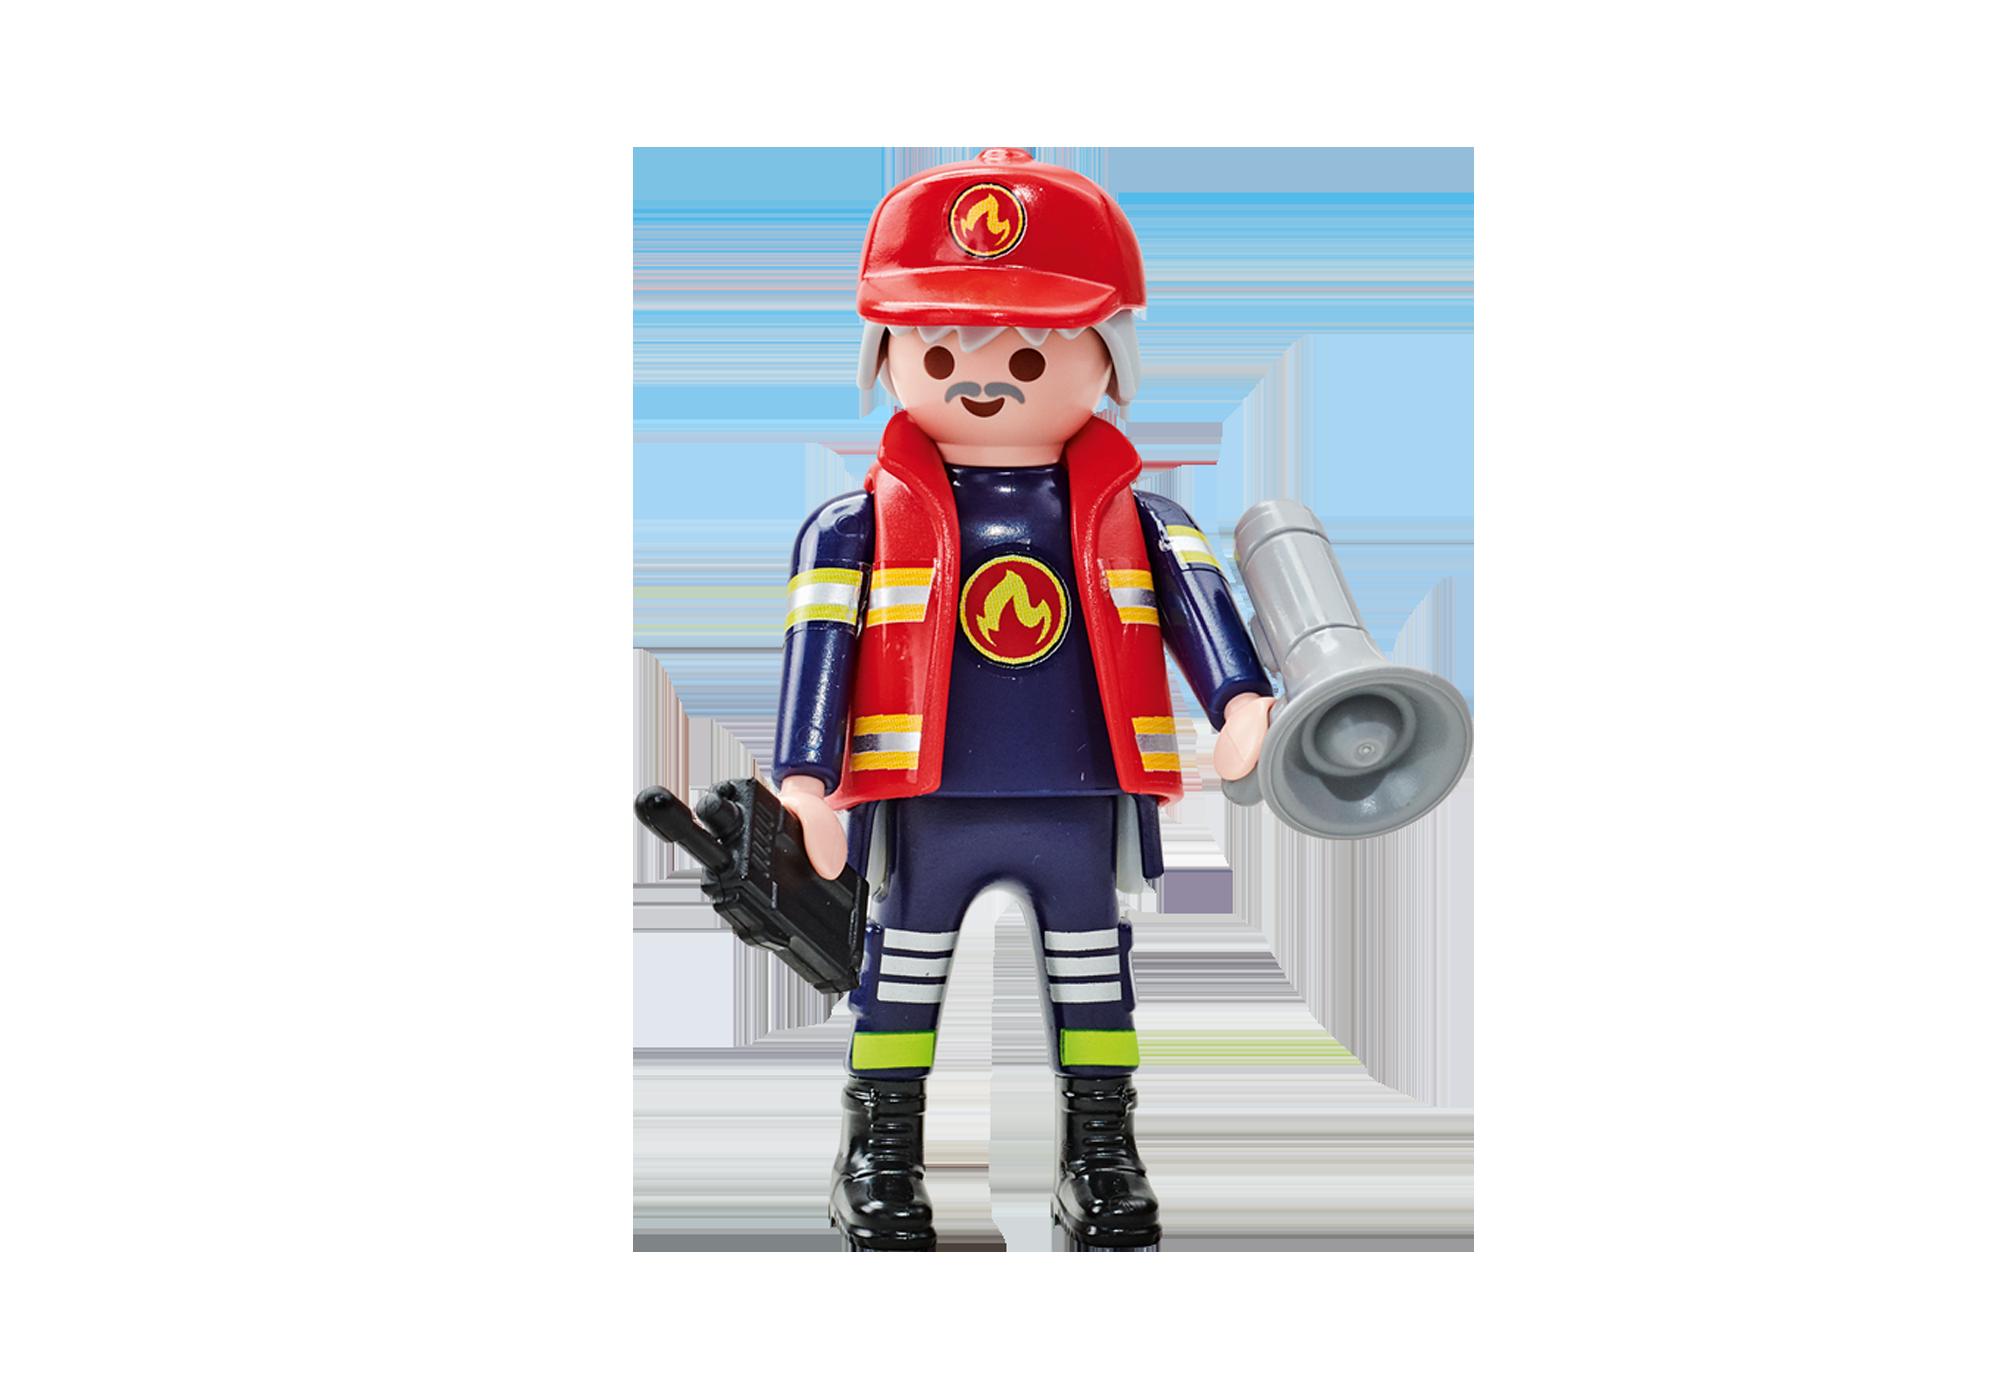 http://media.playmobil.com/i/playmobil/6585_product_detail/Capitano dei Pompieri della squadra blu